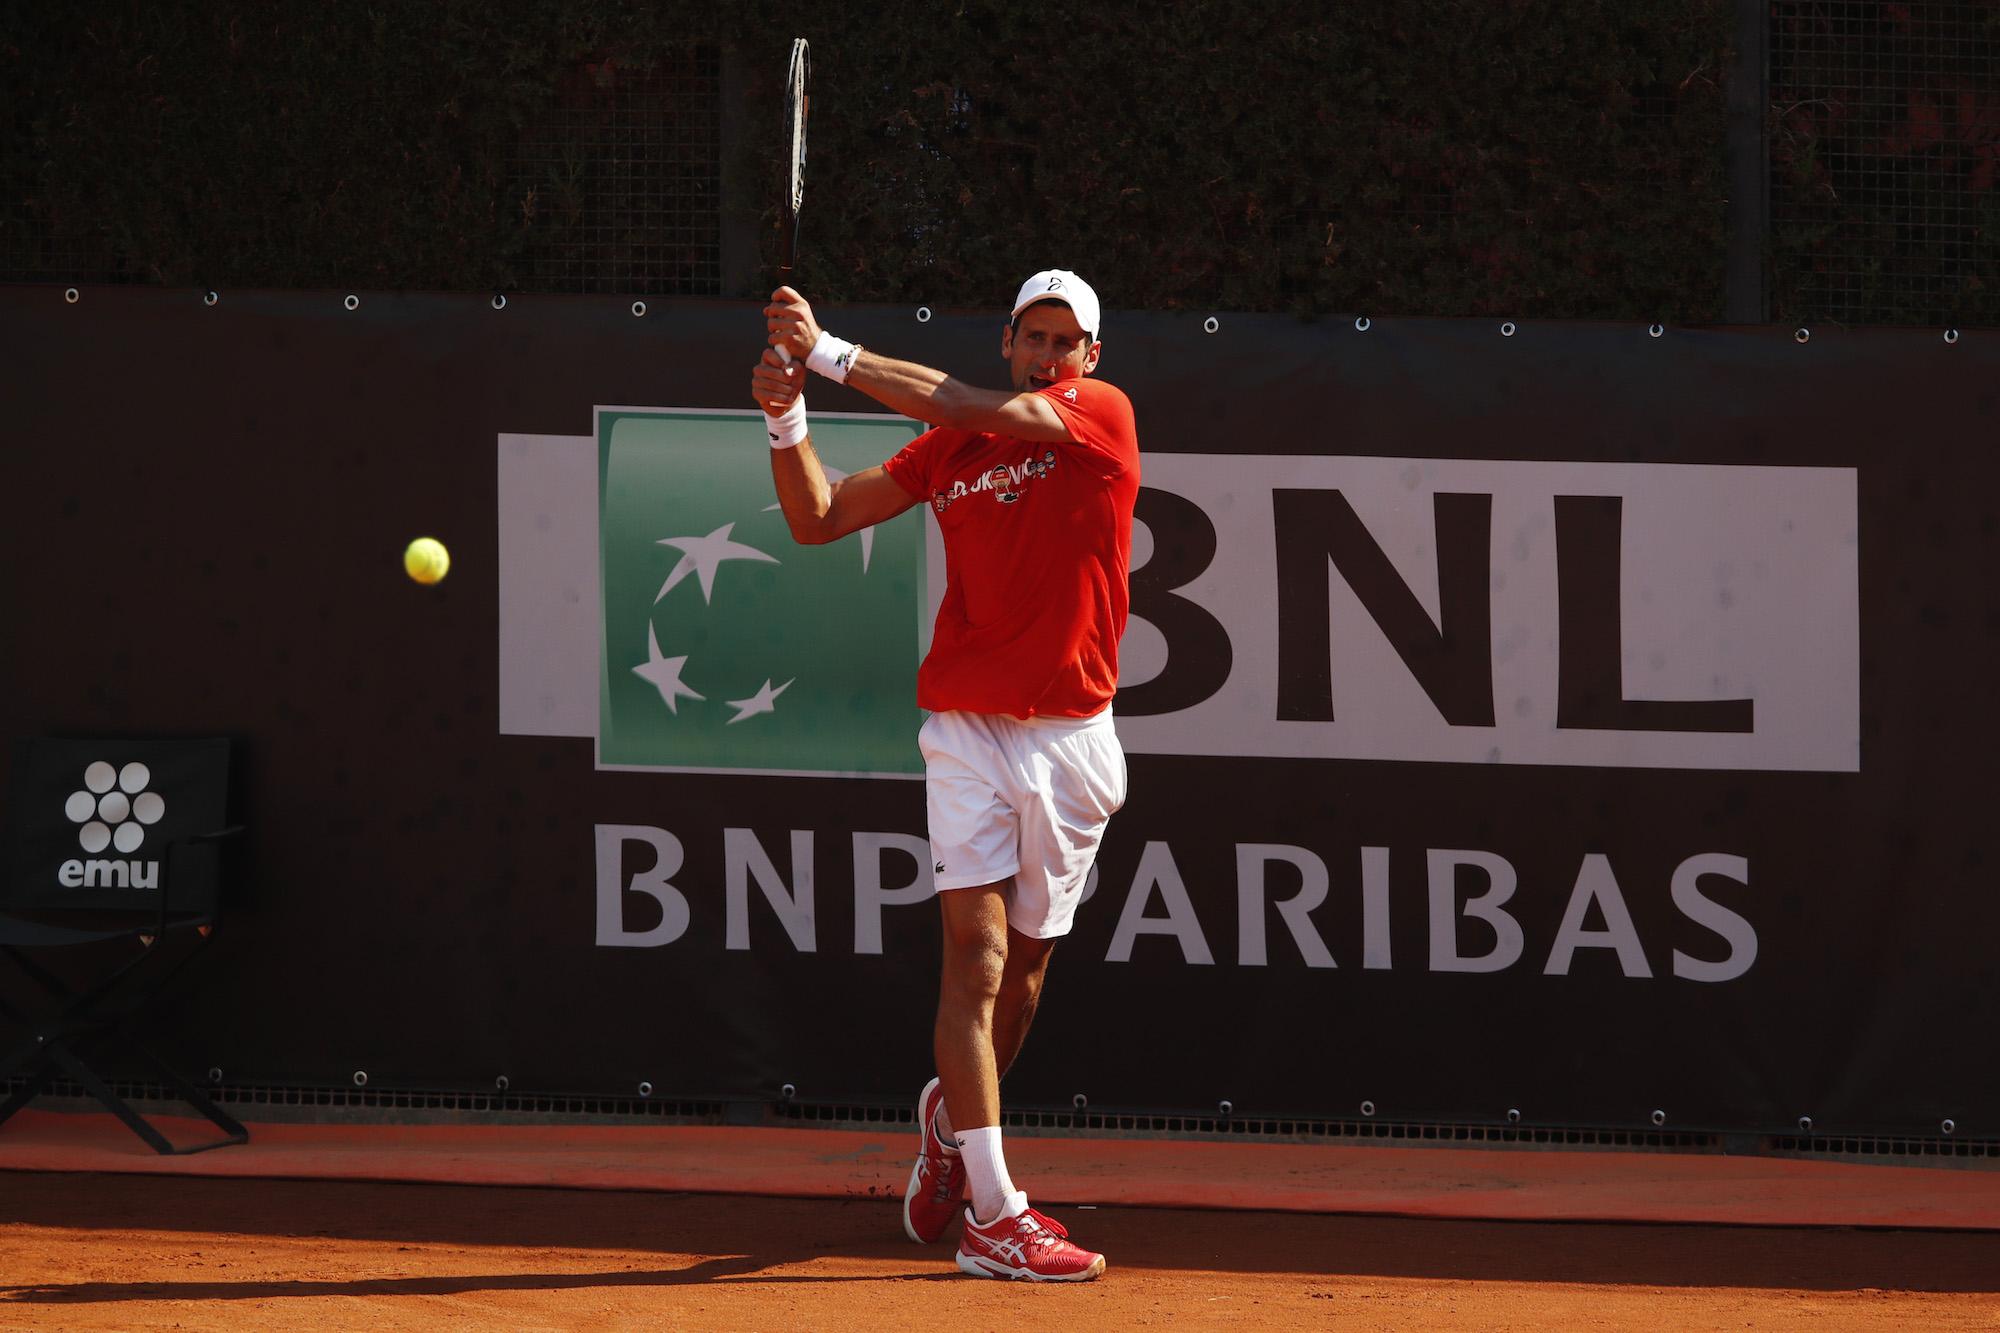 Novak Djokovic Makes No Promises After Shocking Us Open Incident